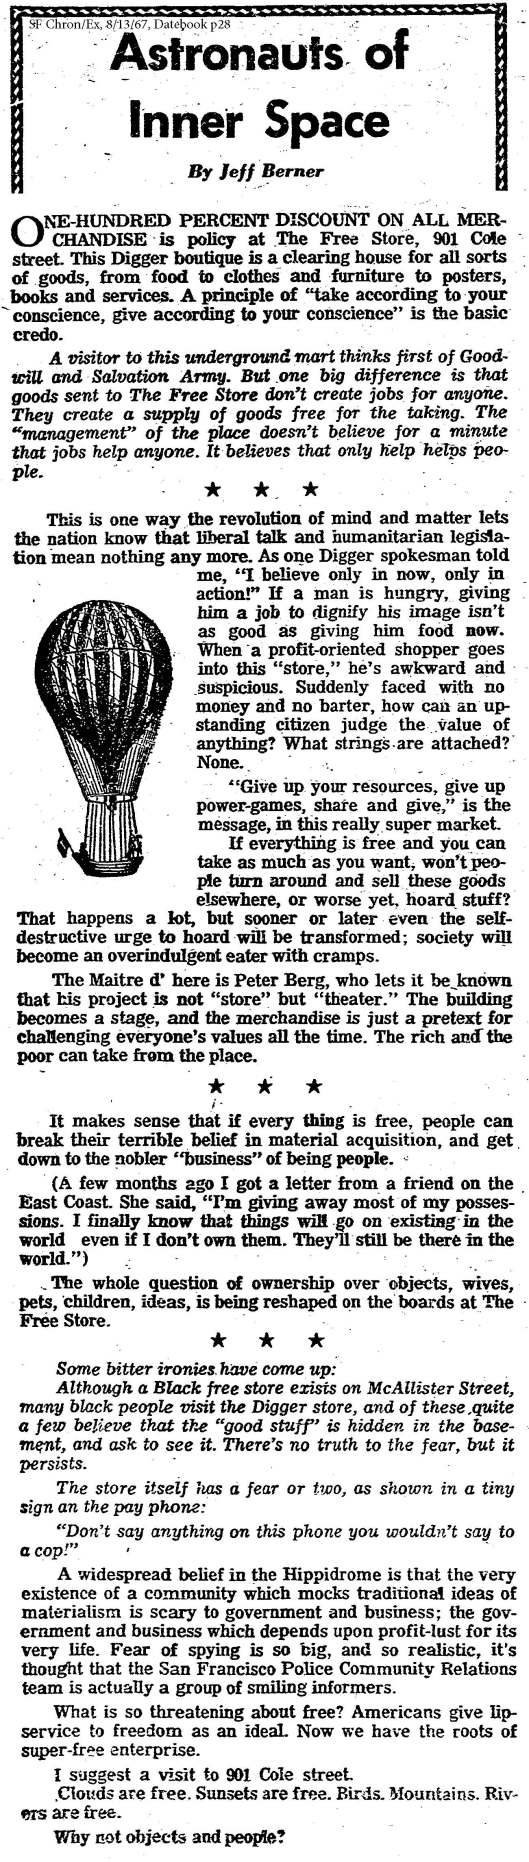 sfchron exam sunday -- berner on free store aug 13 1967 datebook p 28